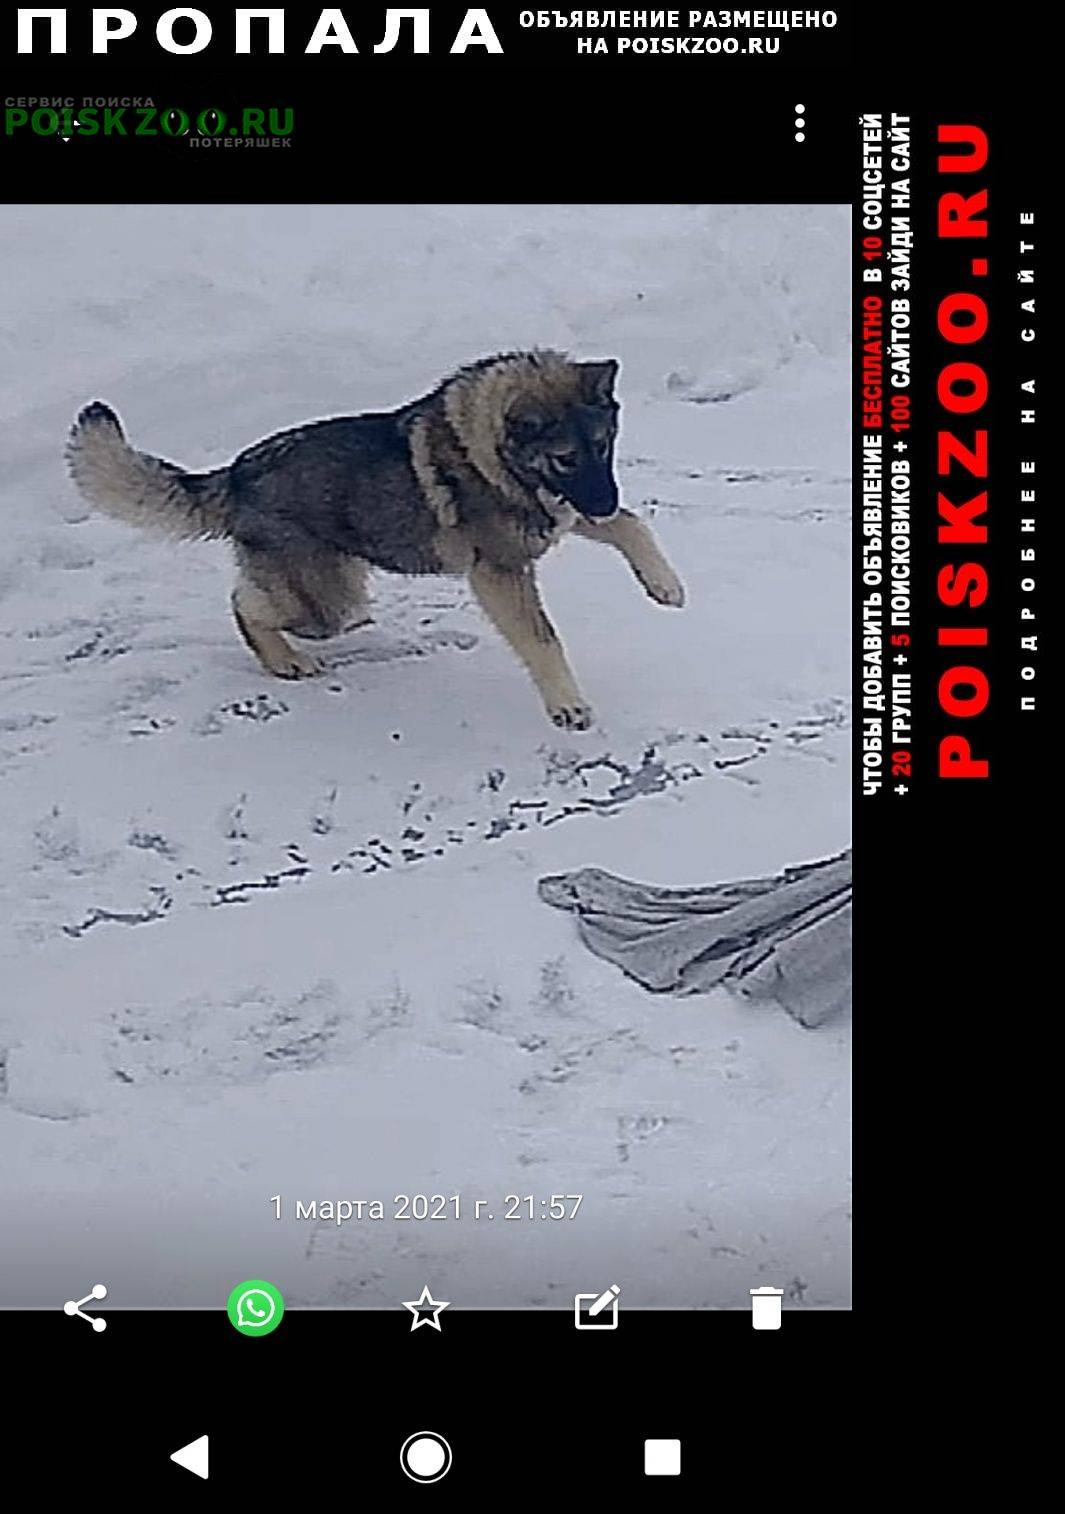 Какие собаки у путина: породы, имена, фото